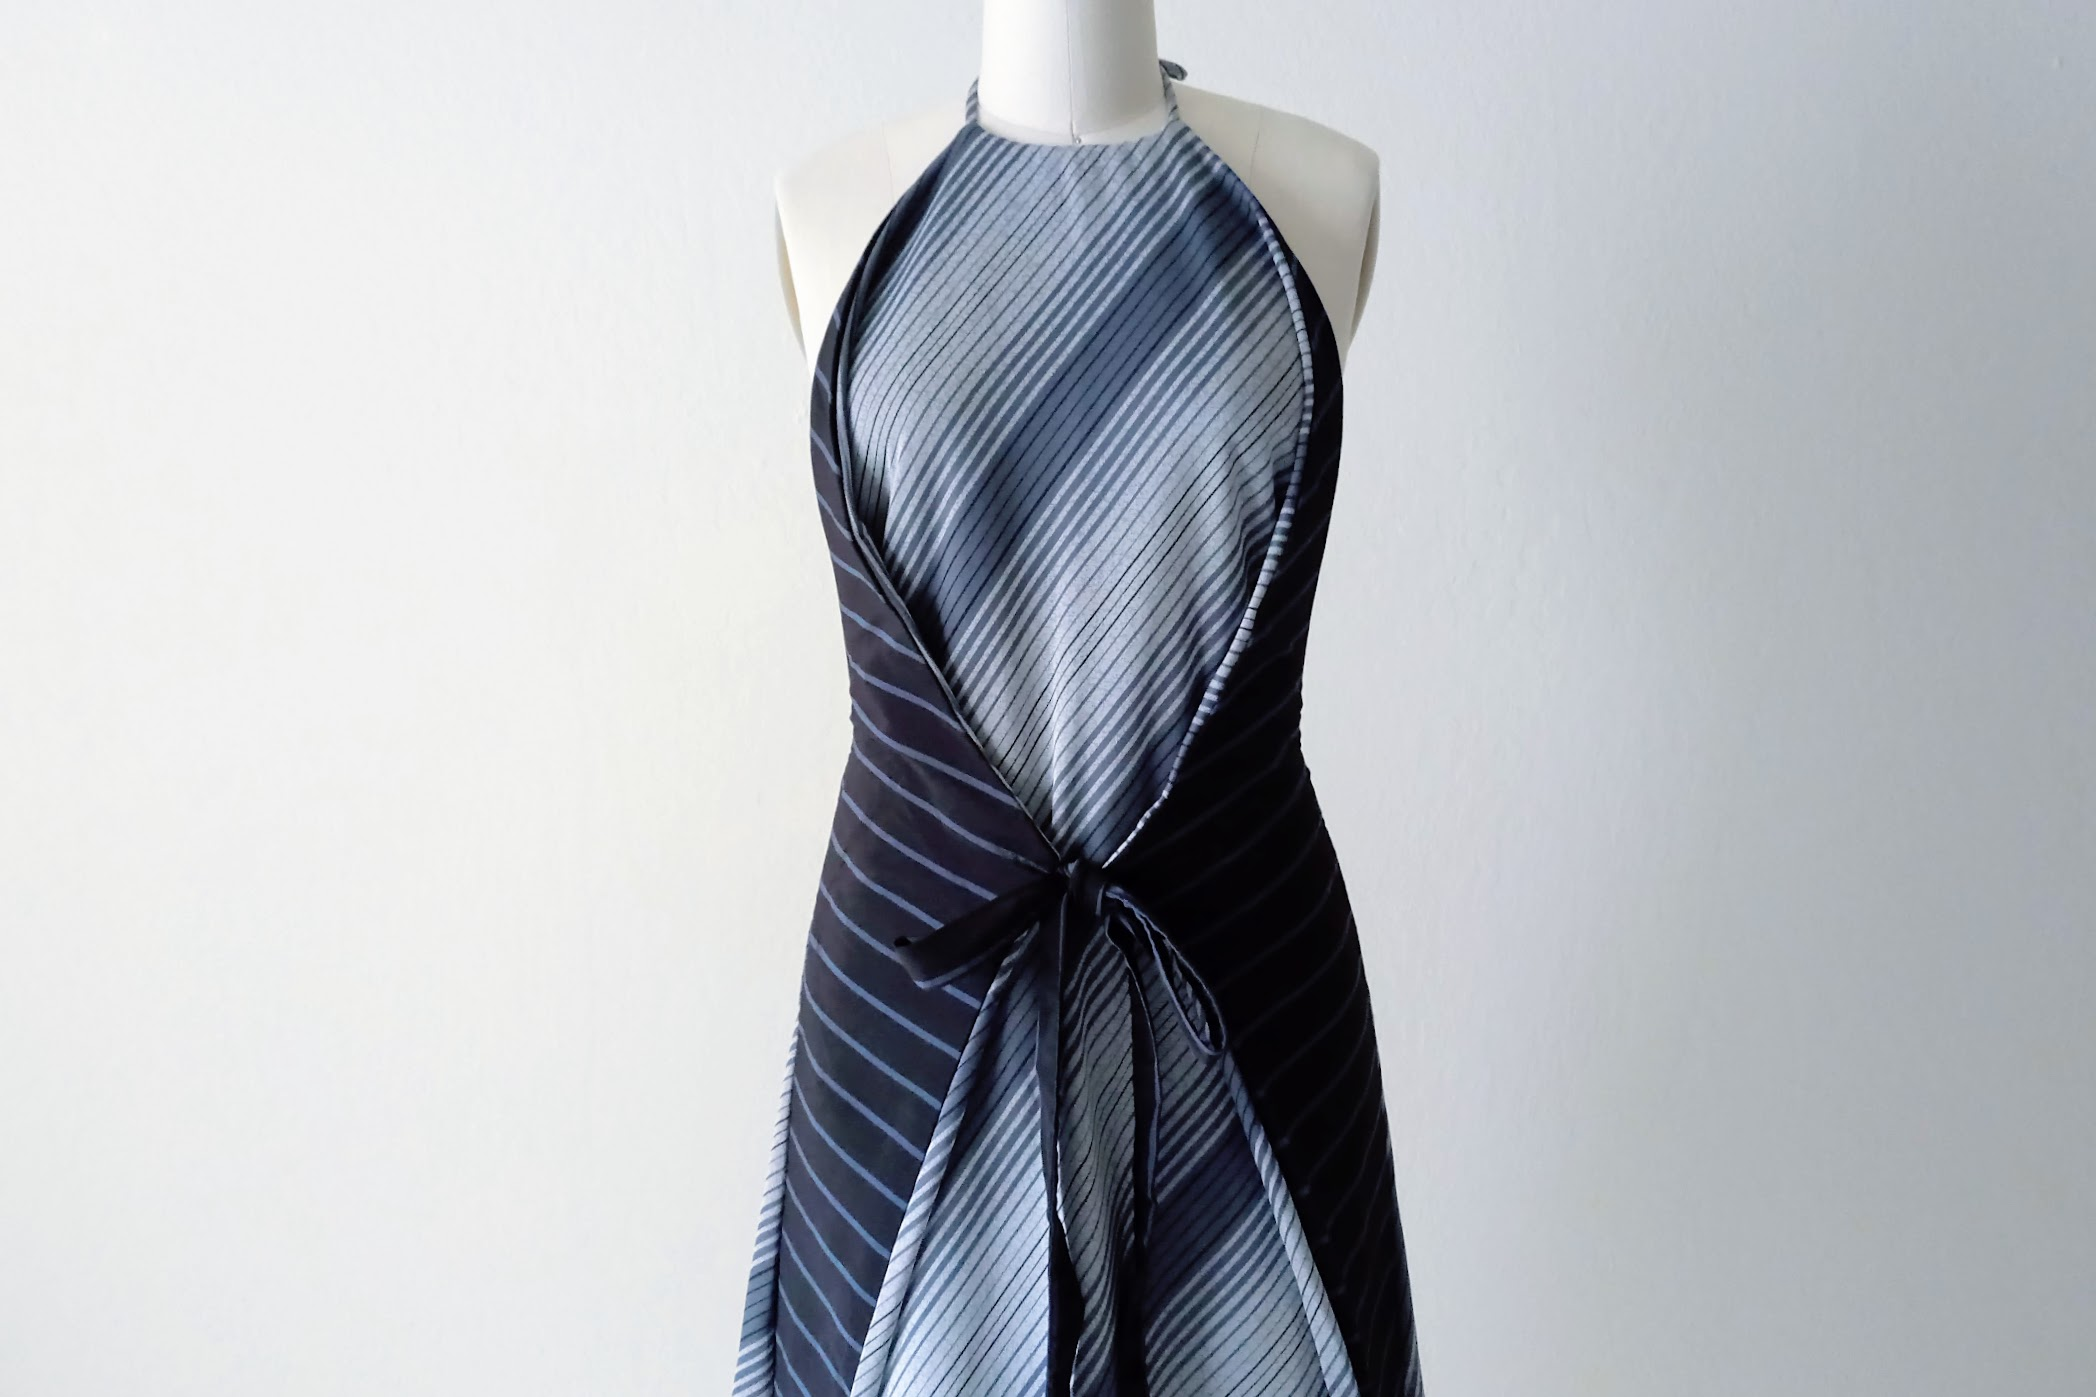 Two-Way Apron Dress | DIY Fashion project | fafafoom.com